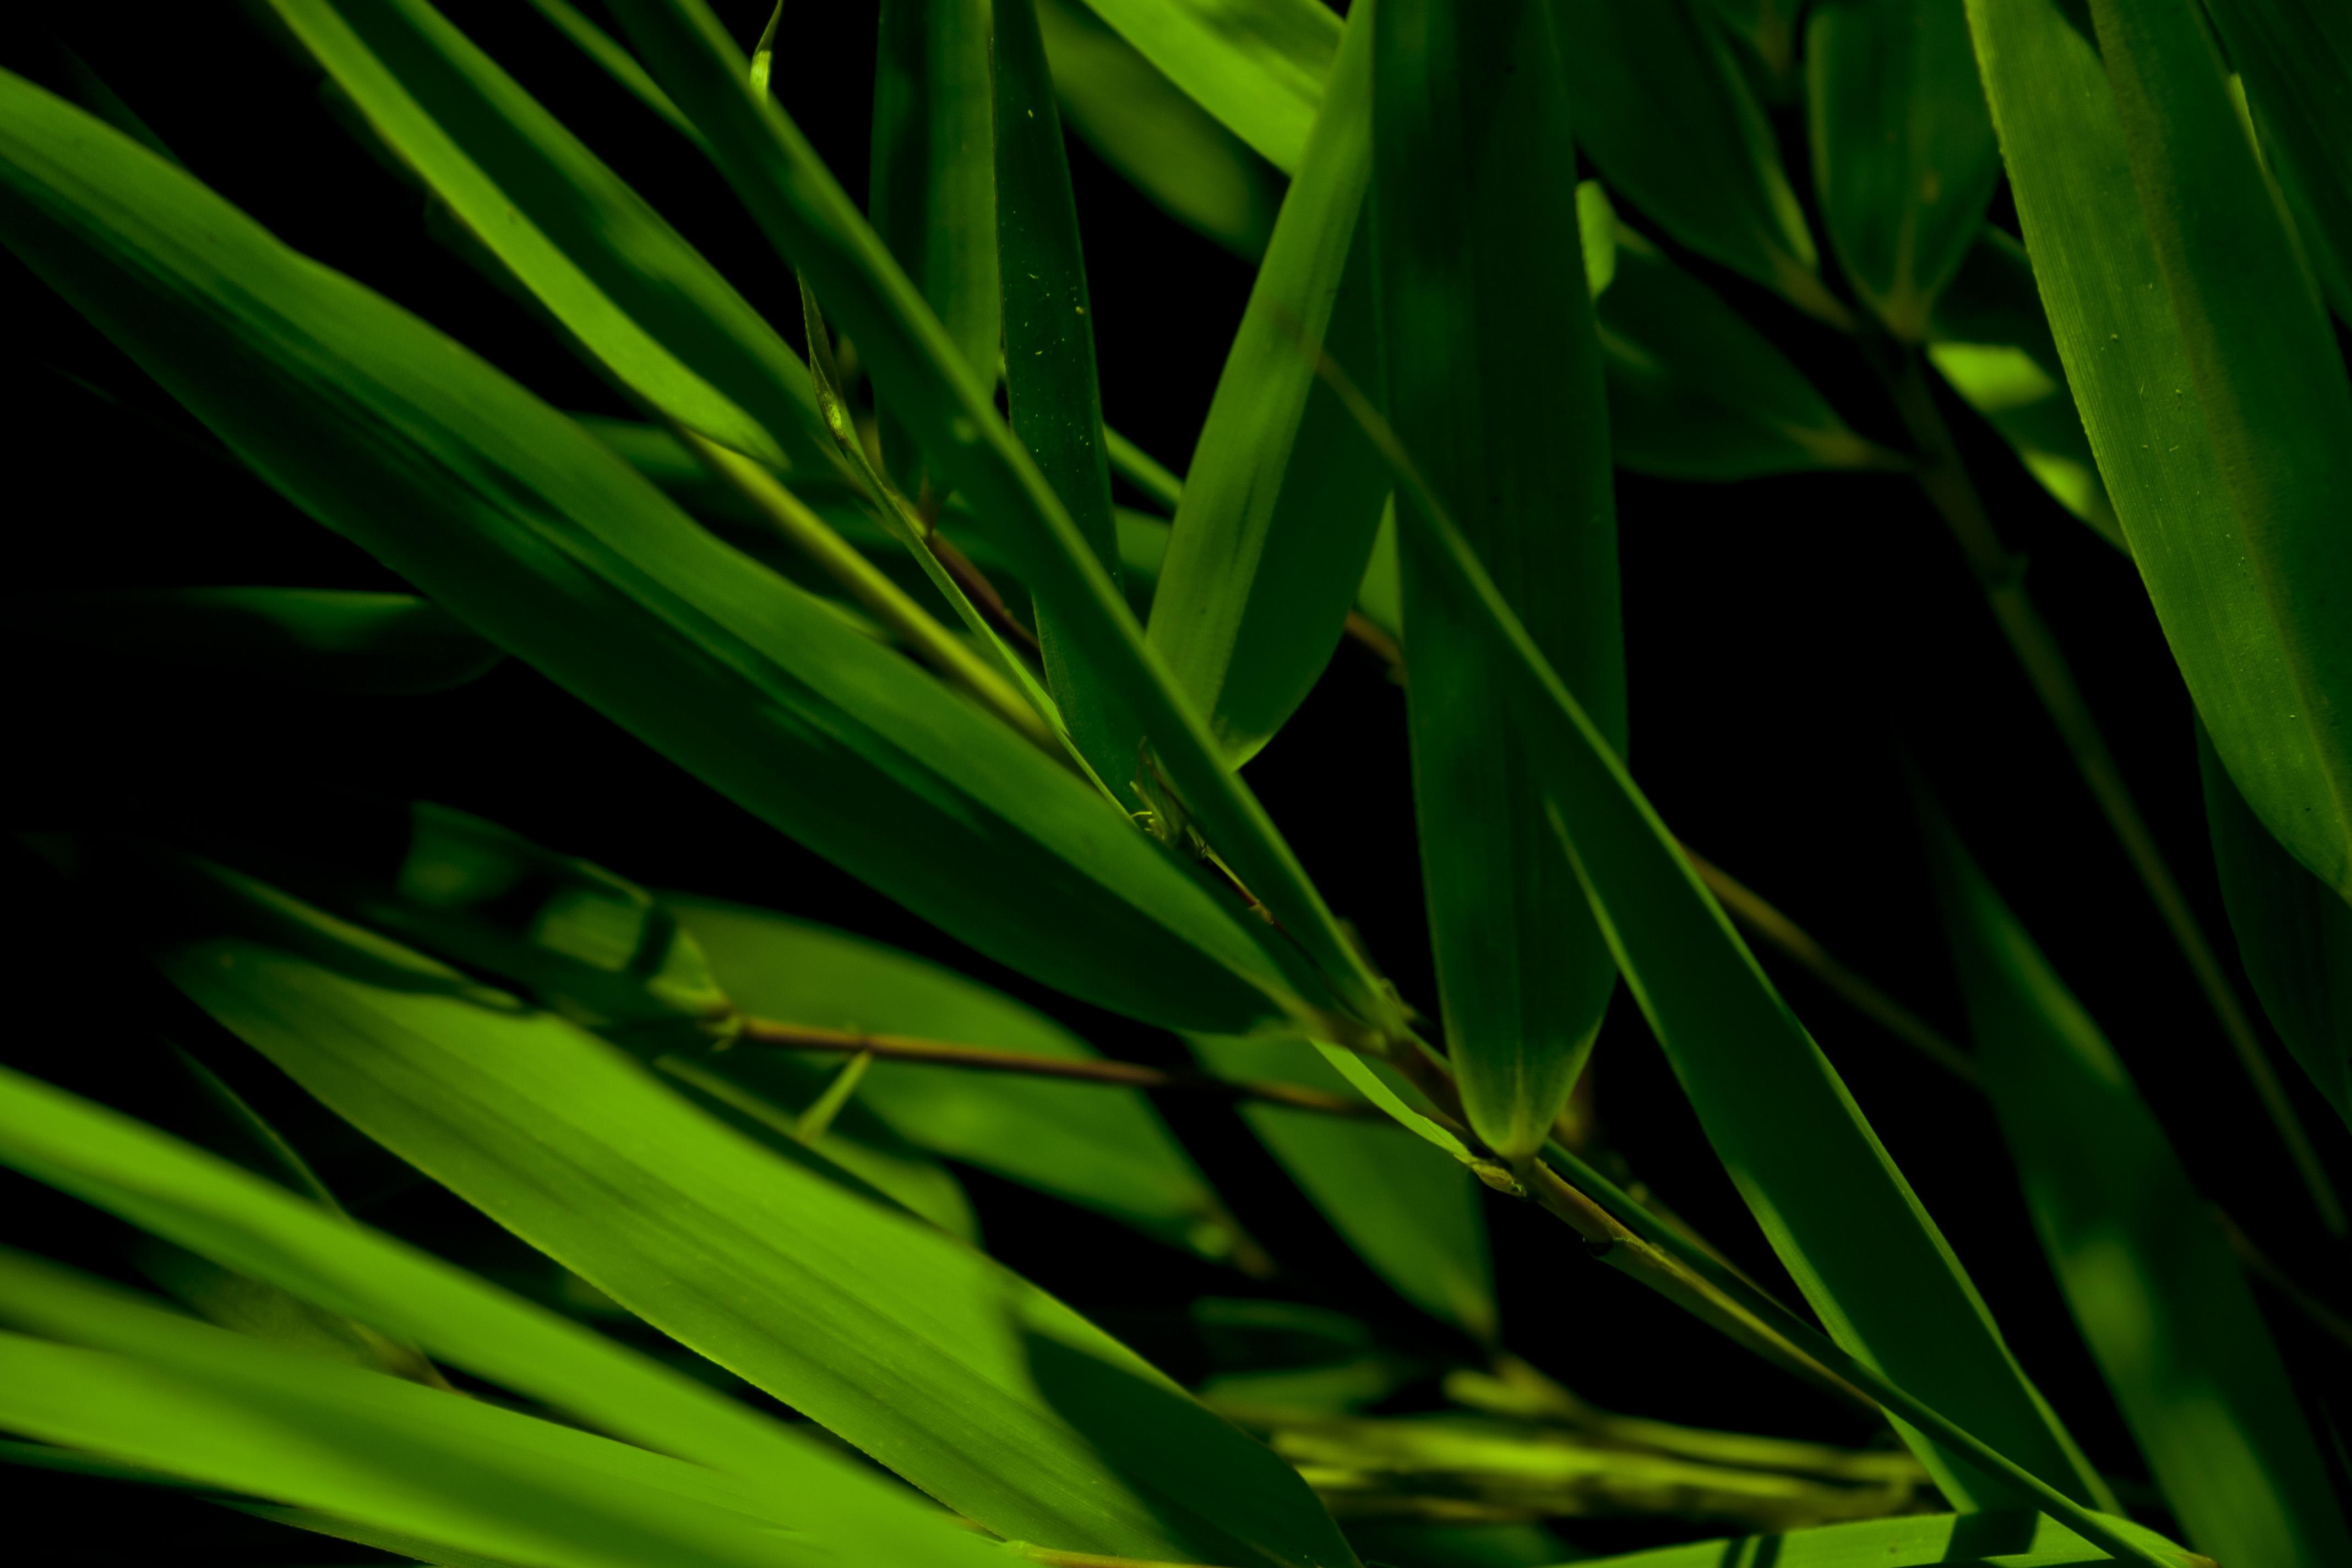 Bamboo Wallpaper Tropical